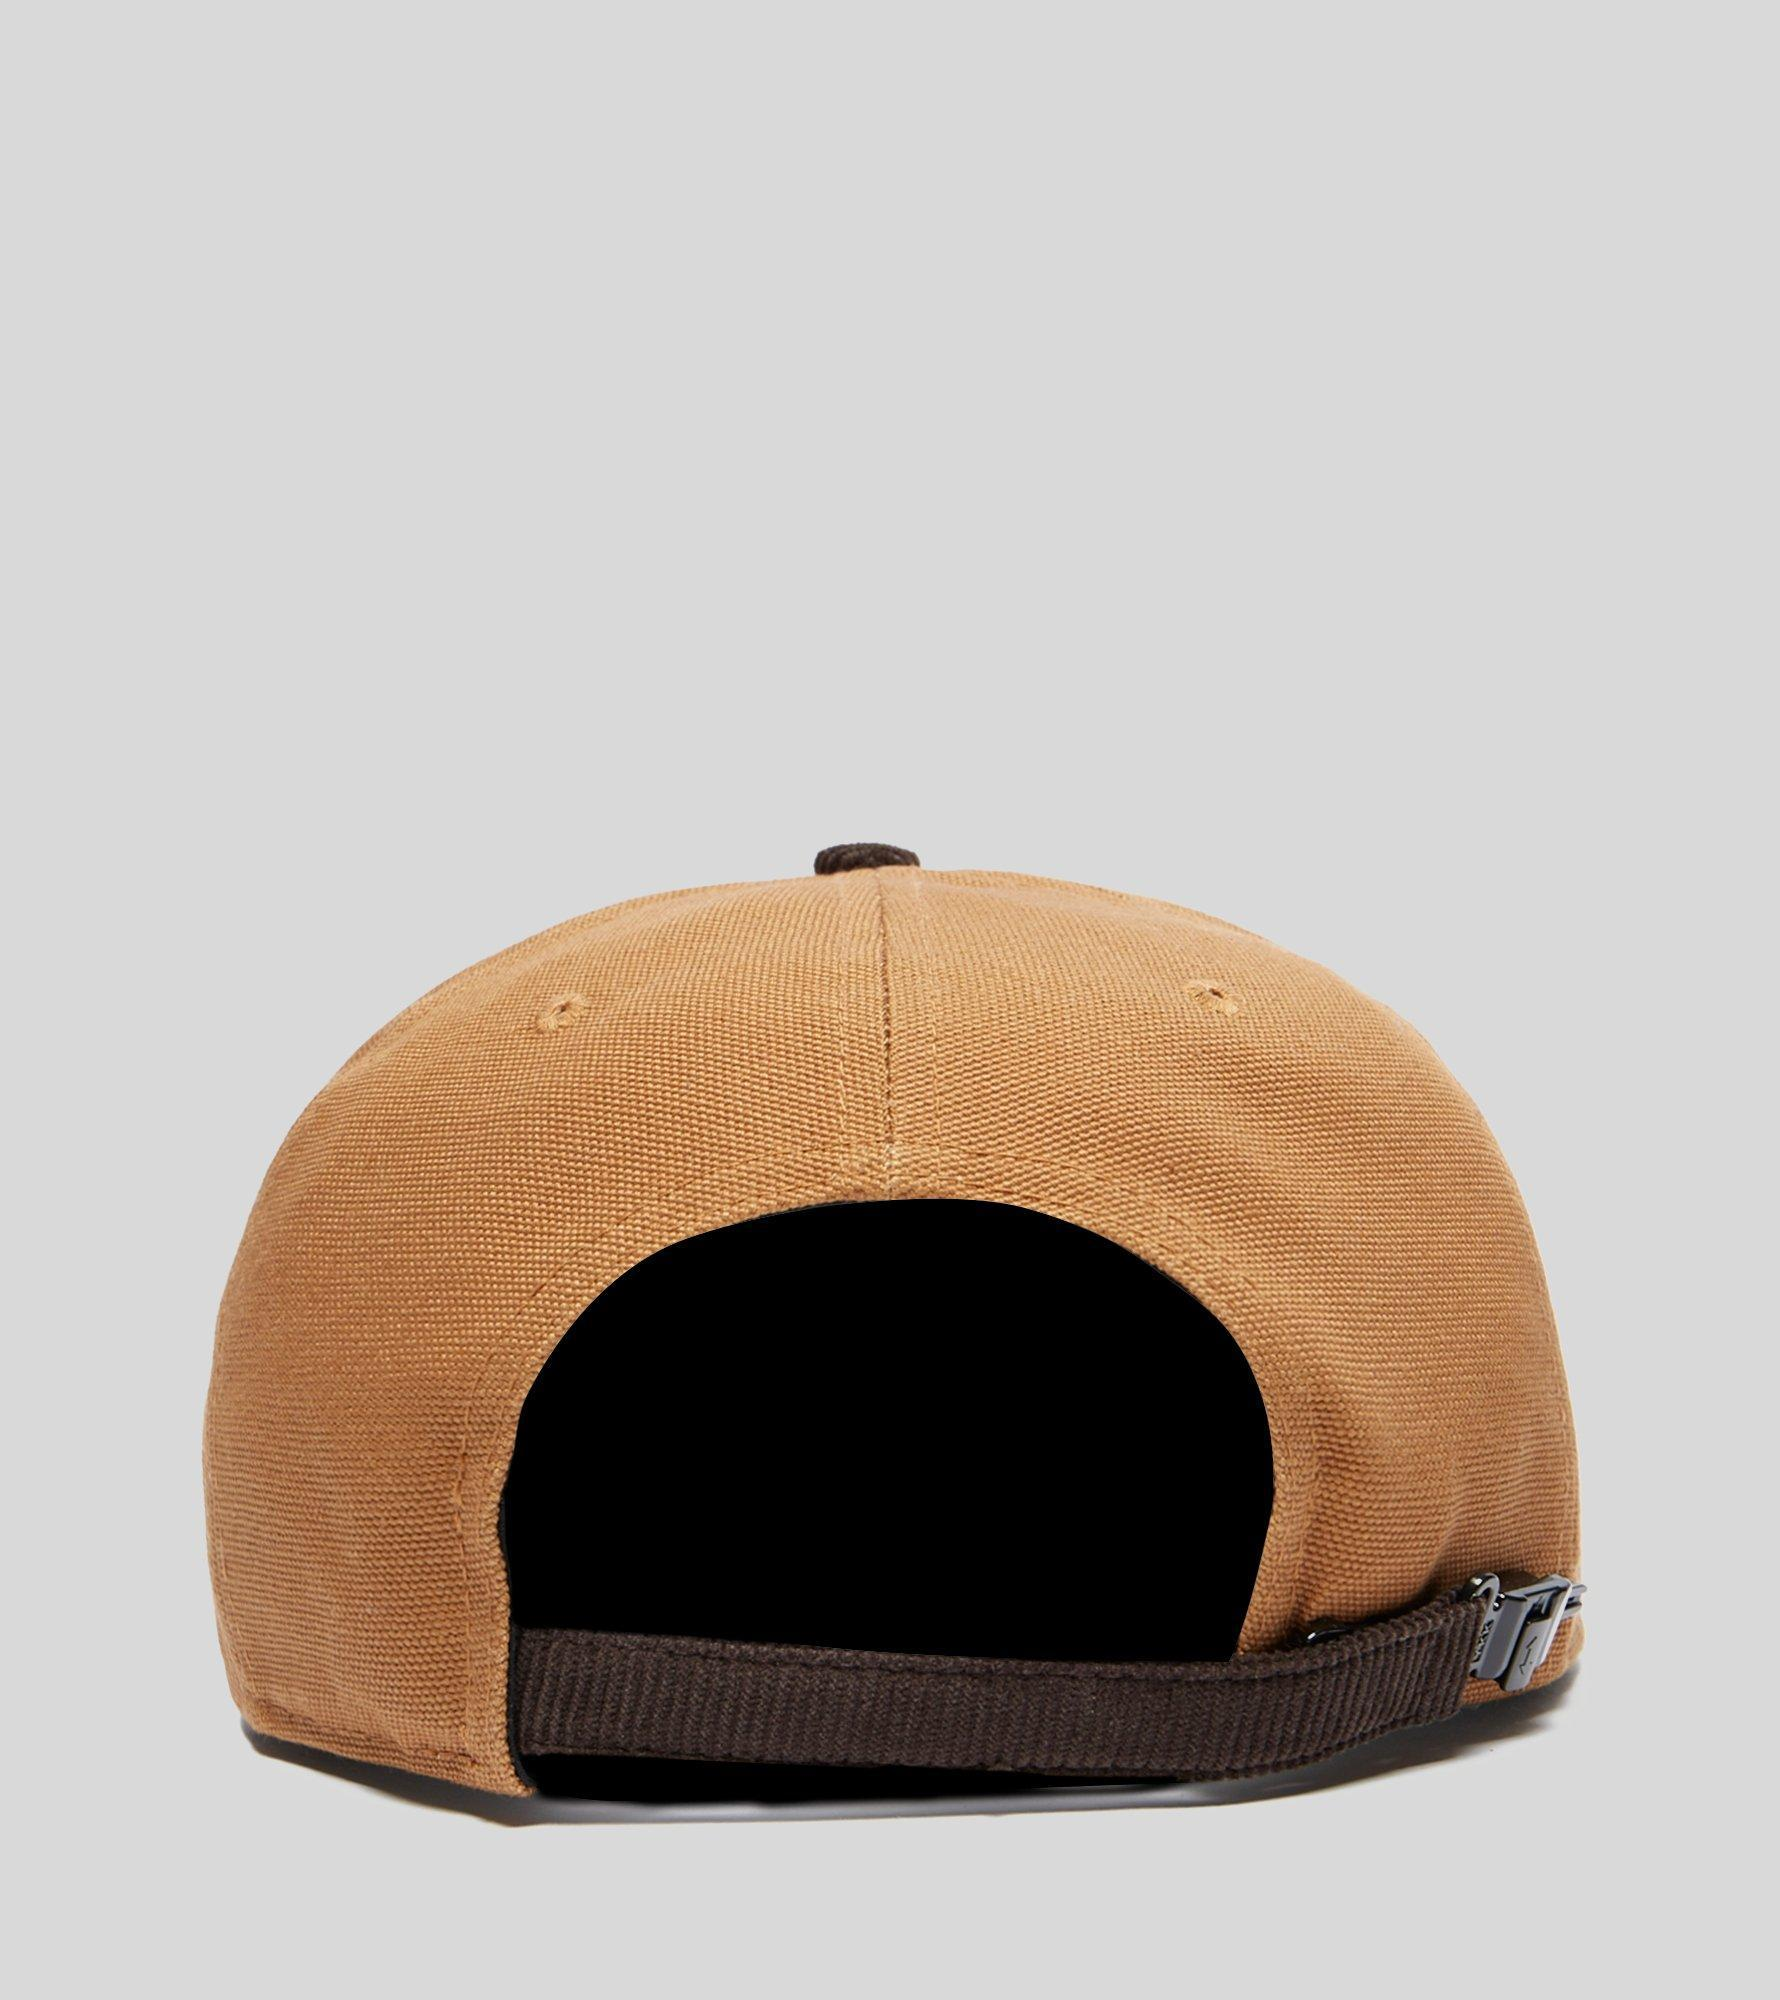 Lyst - Nike X Carhartt Wip Nrg Pro Cap in Brown for Men 733c34d6bd61